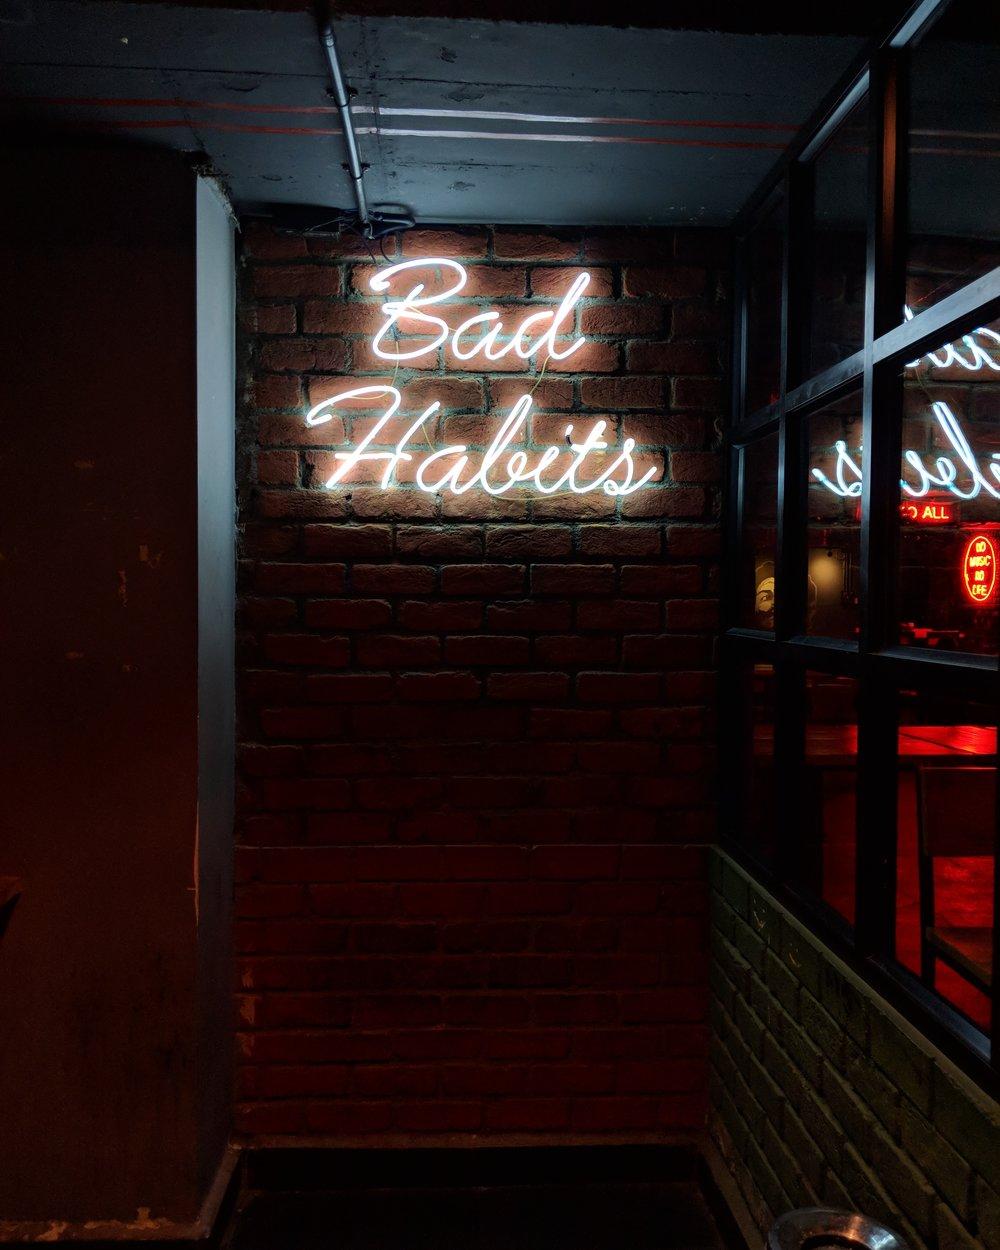 white-neon-bar-bad-habits.jpg